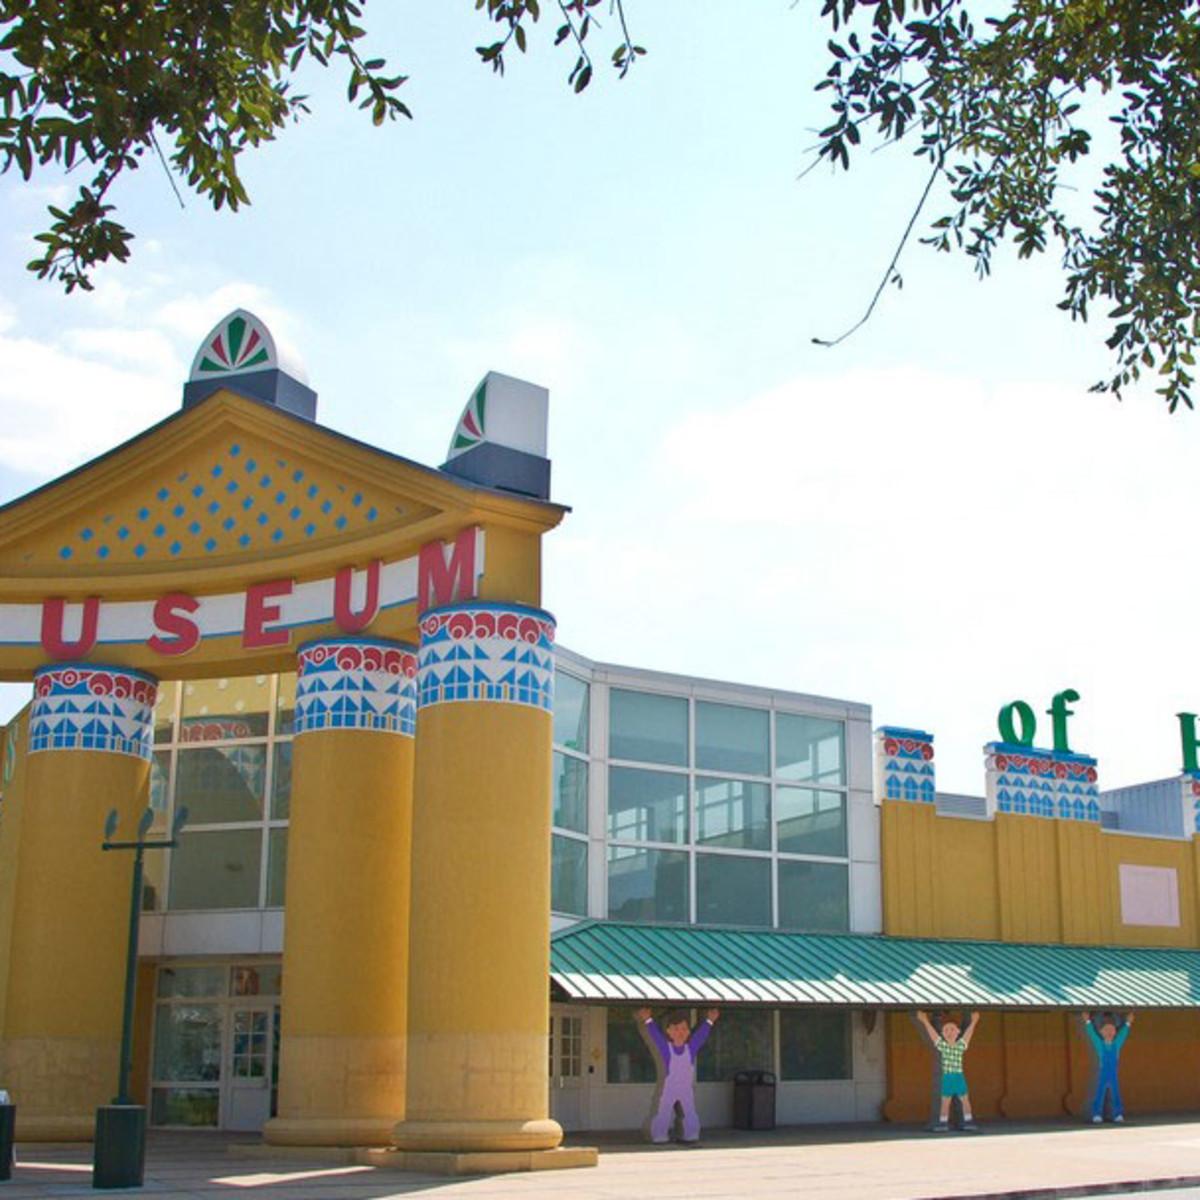 Places-A&E-Children's Museum of Houston-exterior-1